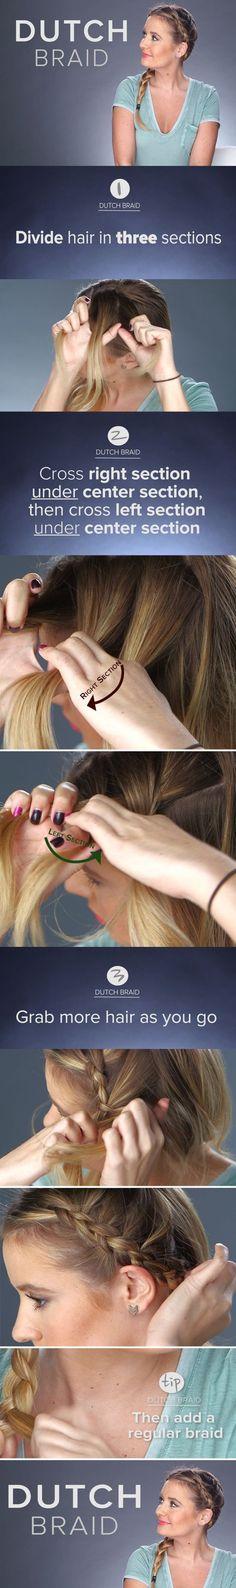 How To: The Dutch Braid